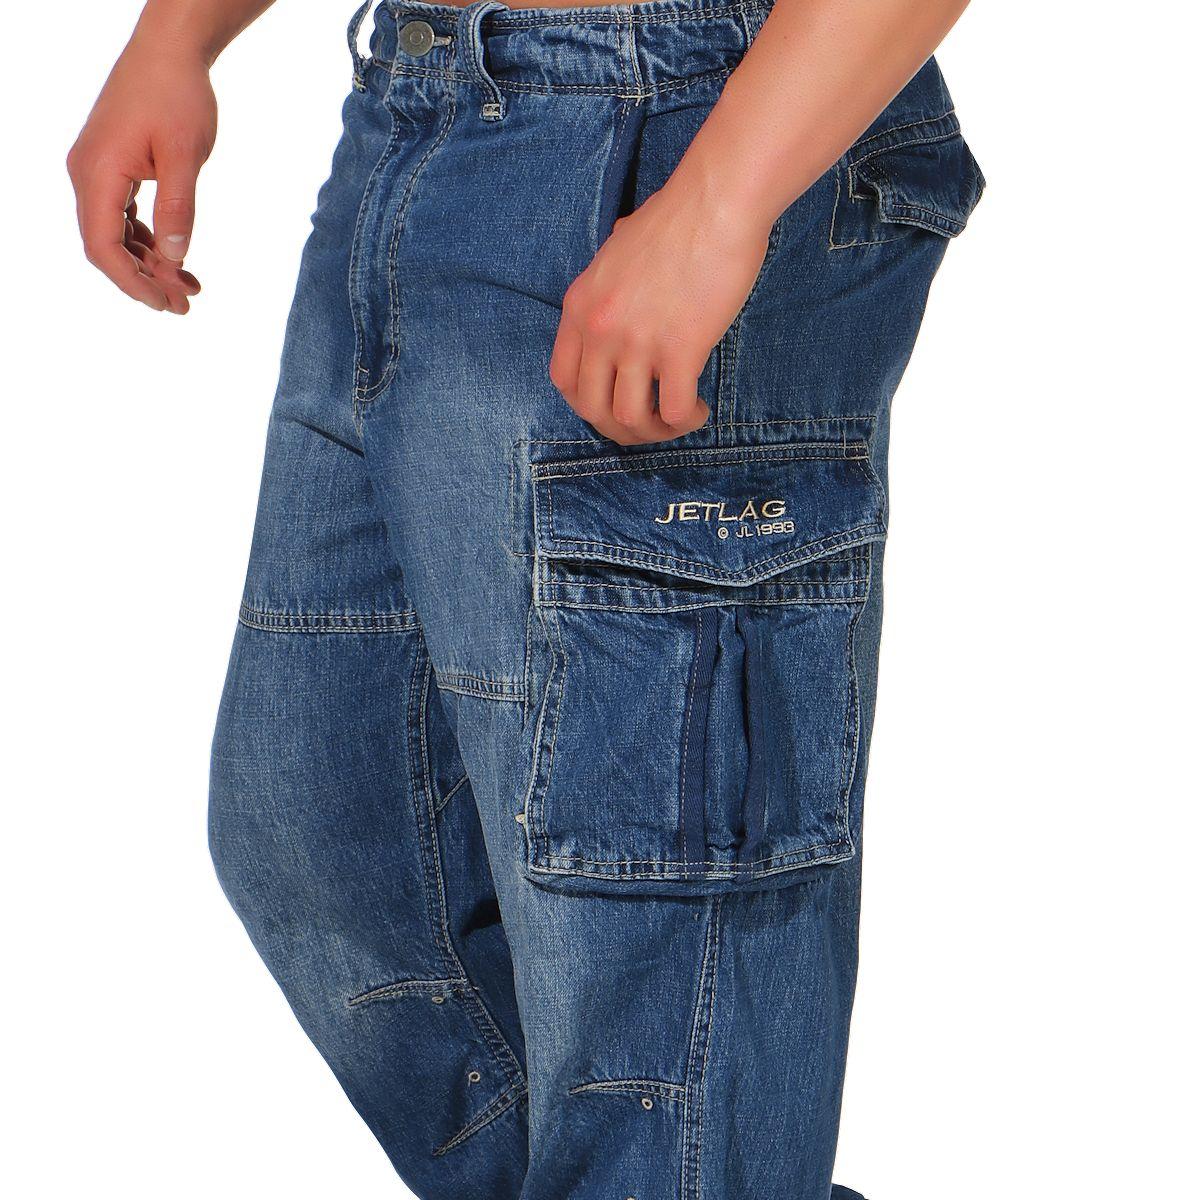 JET LAG HERREN Cargohose Hose lang Jeanshose Cargojeans